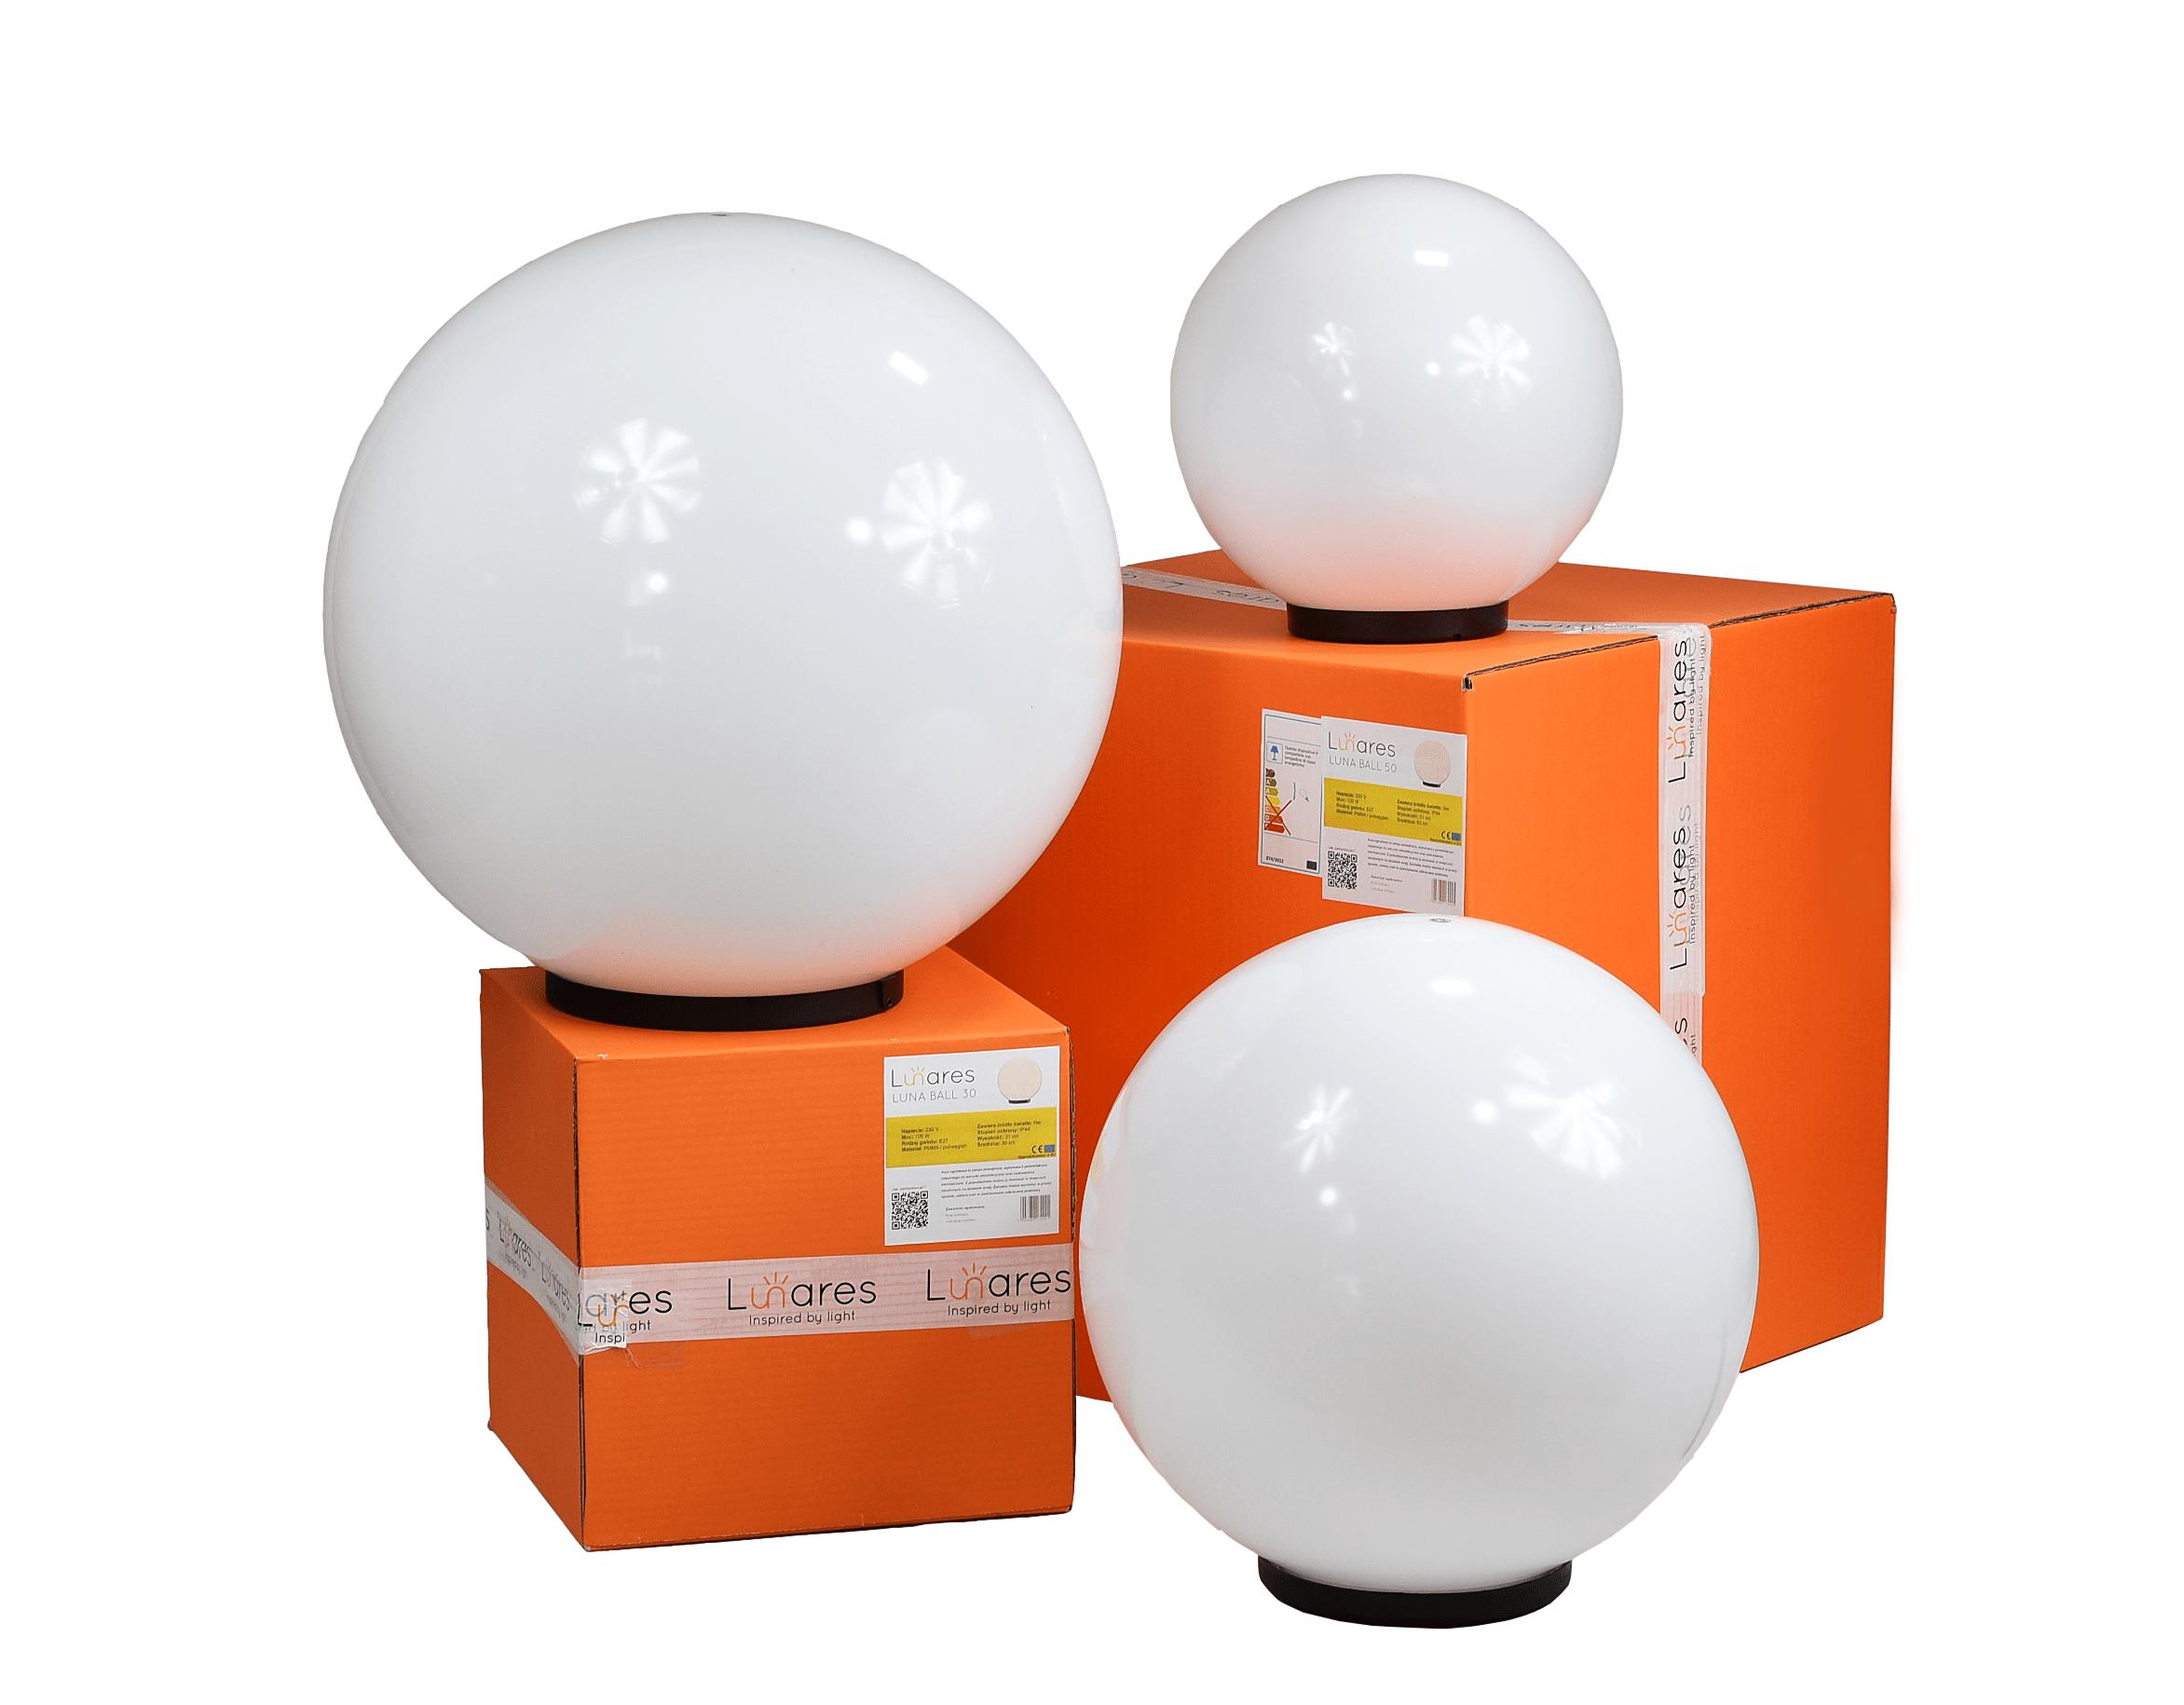 Dekoracyjne Lampy Kule Ogrodowe - Luna Balls 20,30,40cm + Żarówki LED